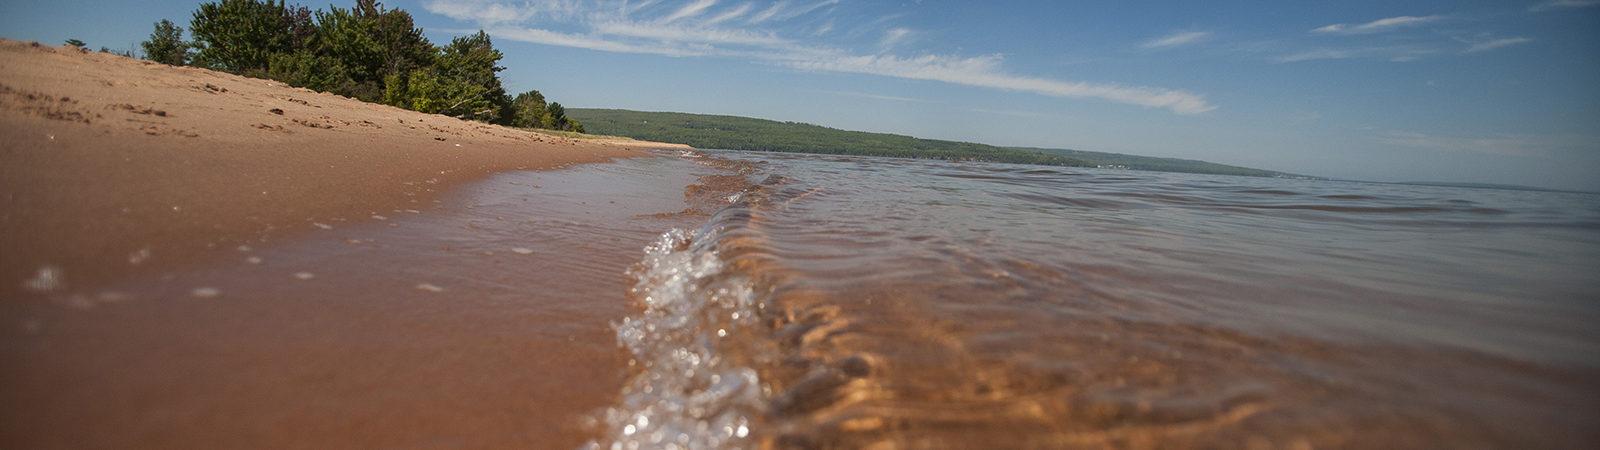 Lake Superior and beach